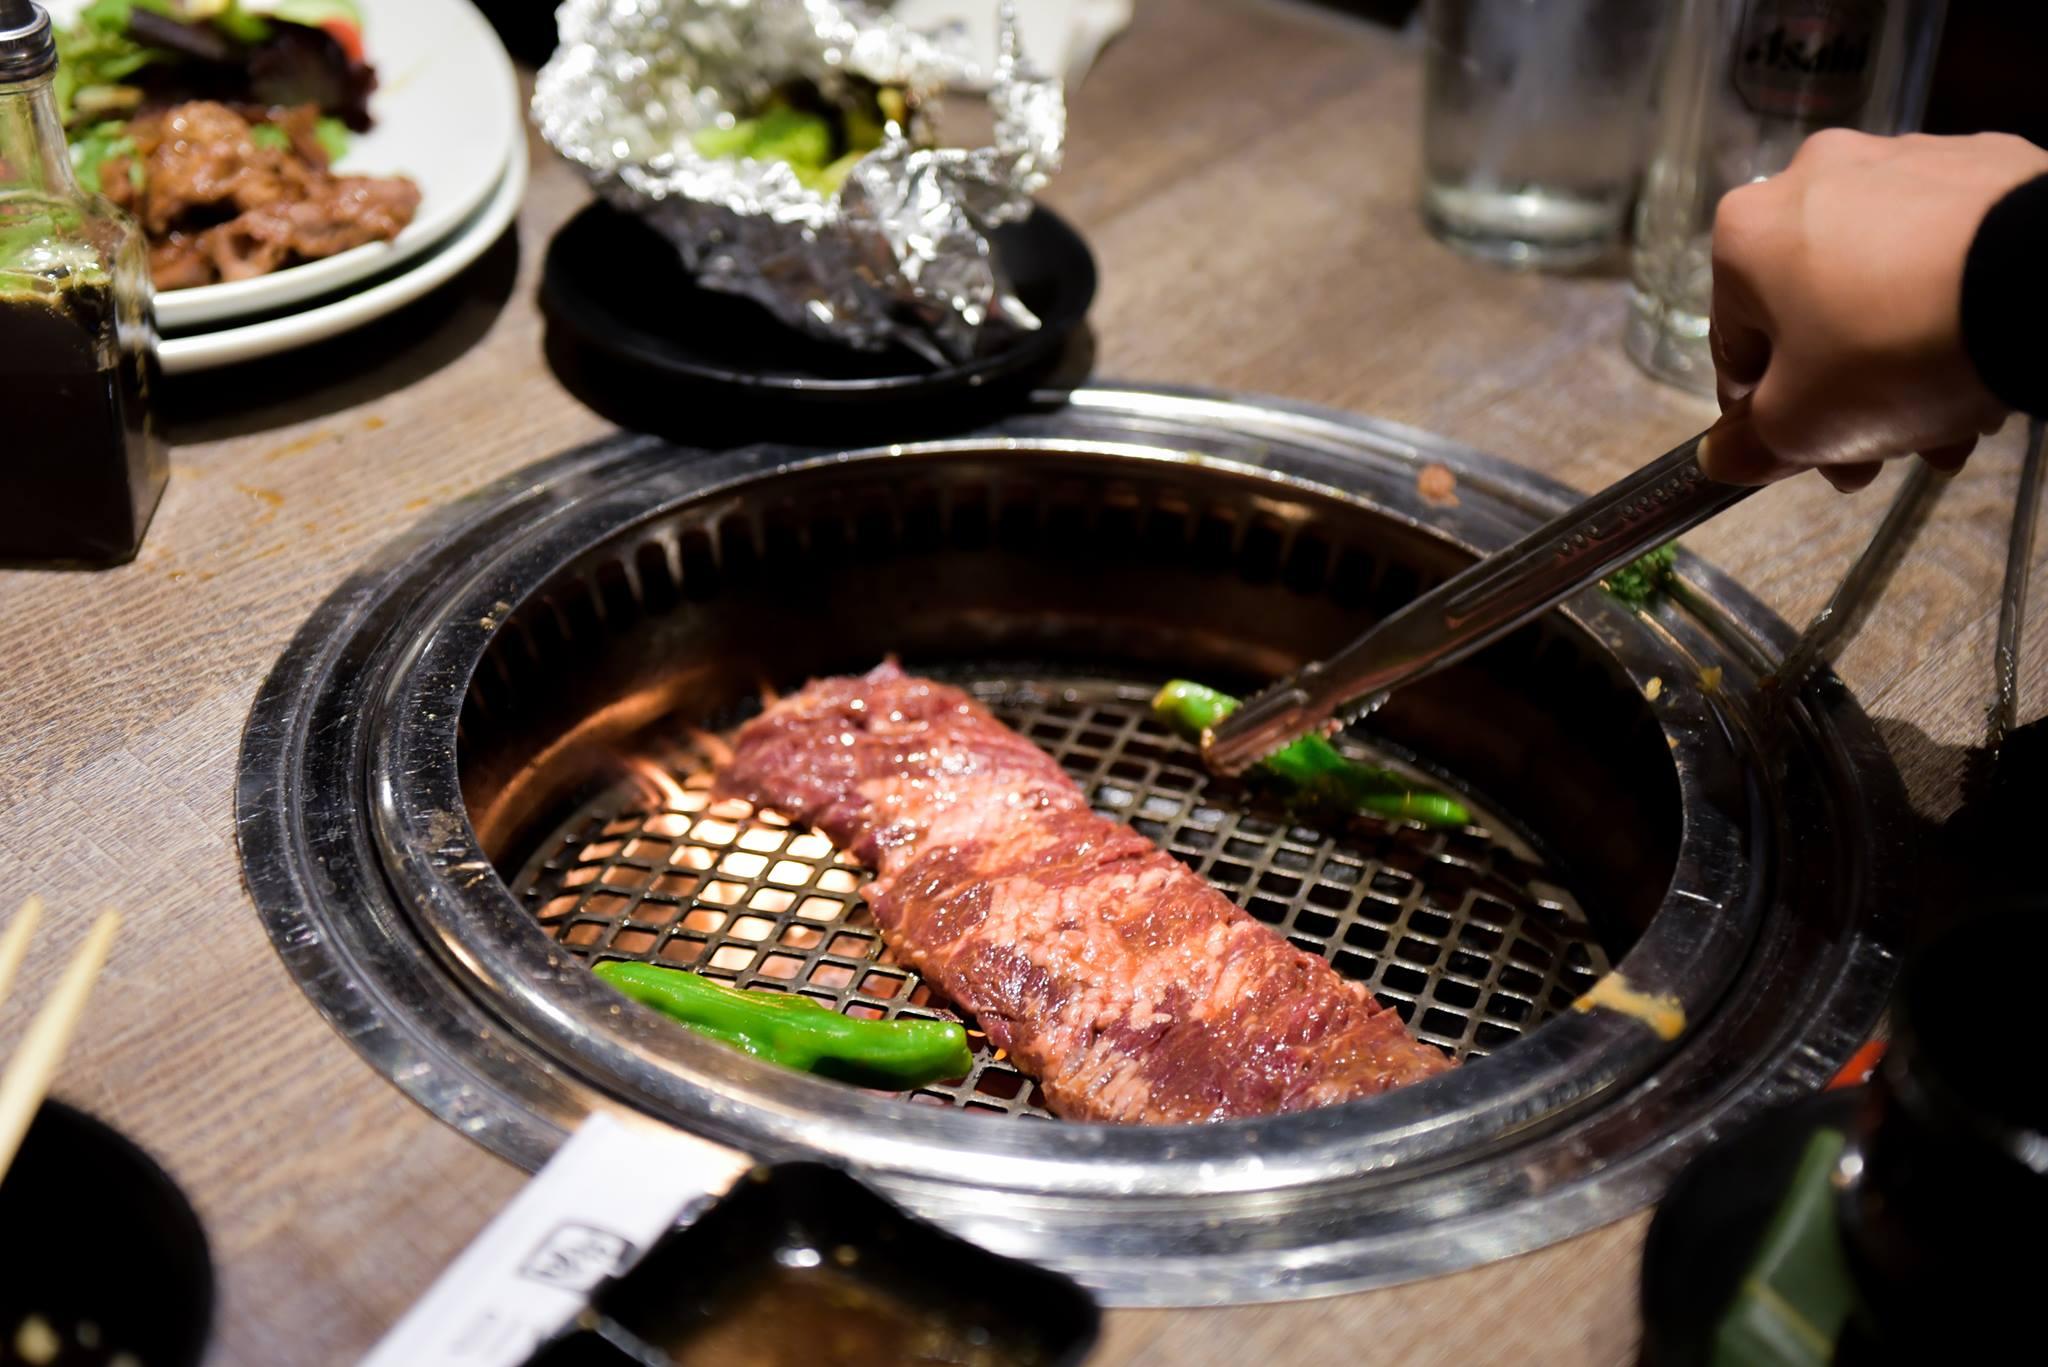 Grilling meats at Gyu-Kaku